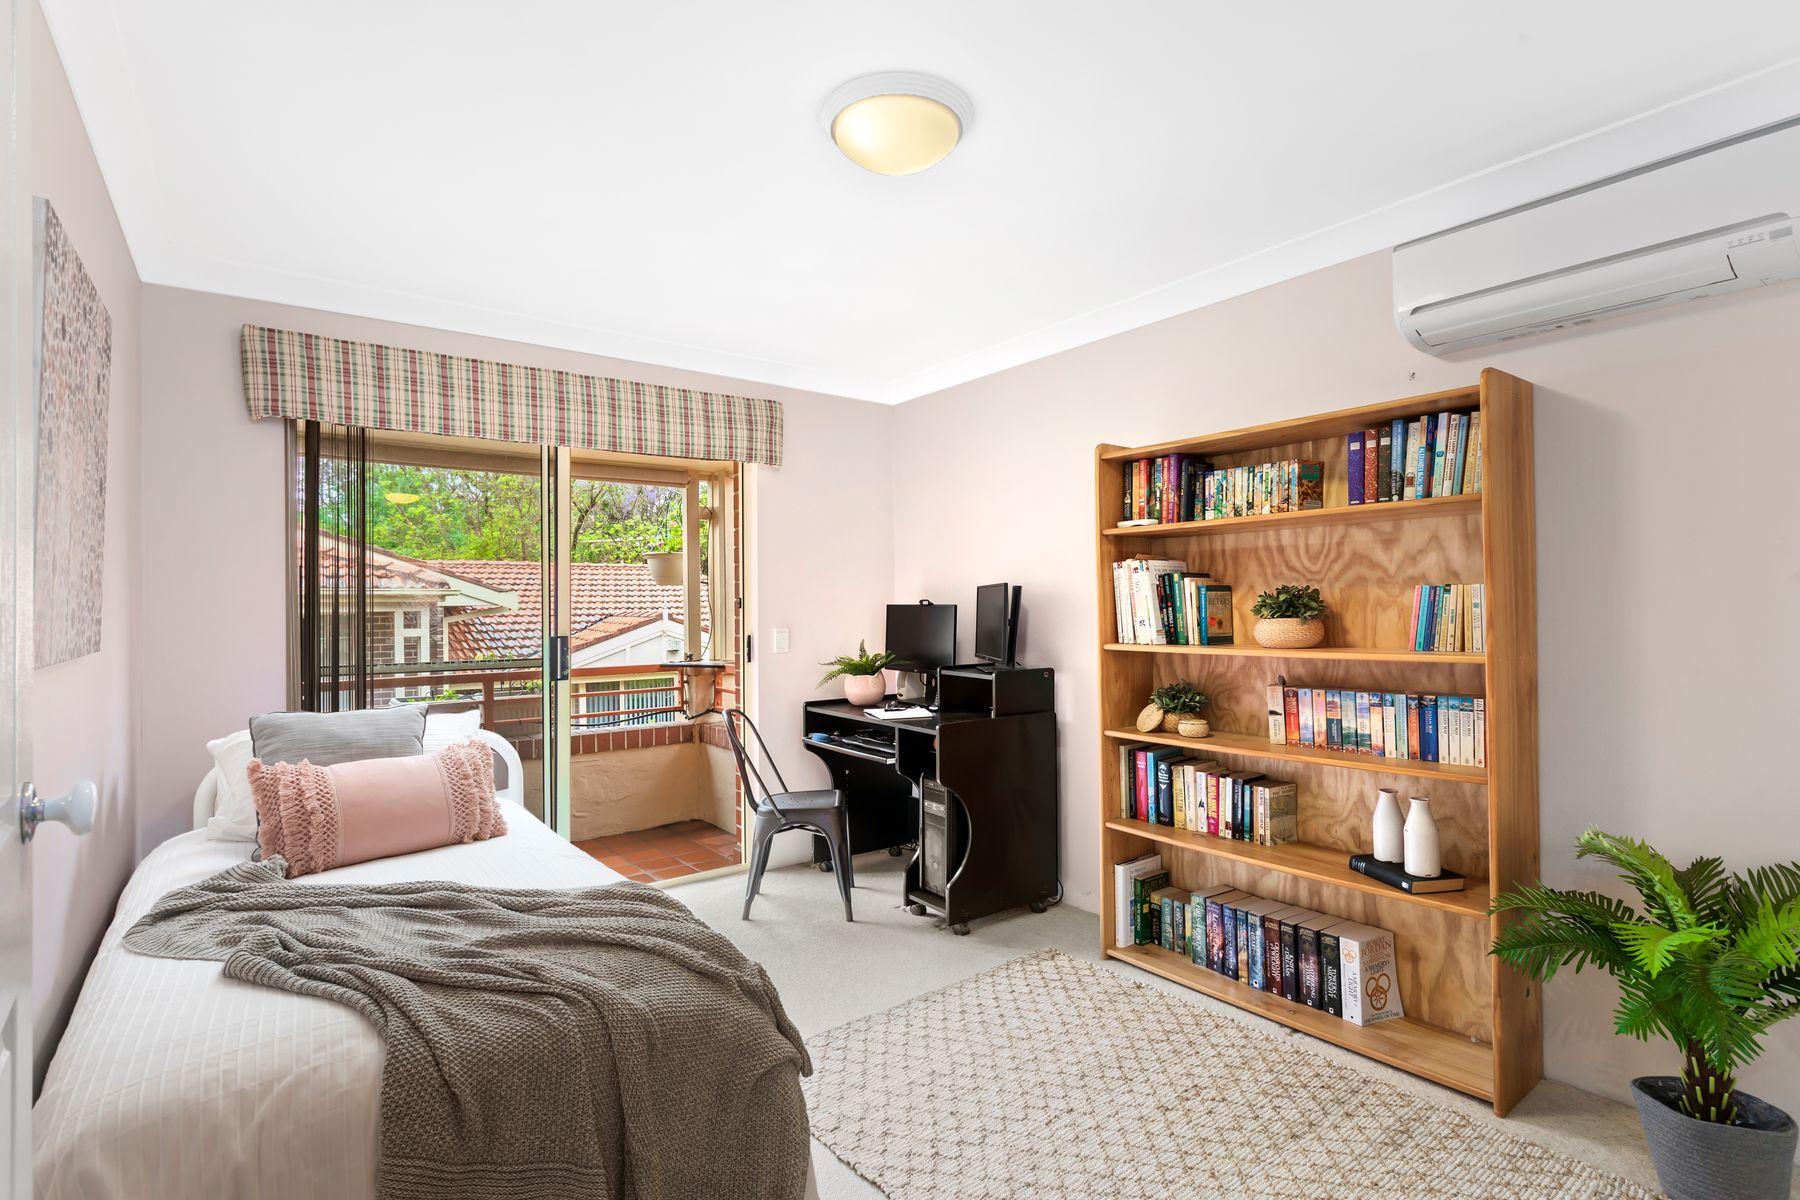 5/9 Cocos Avenue, Eastwood, NSW 2122